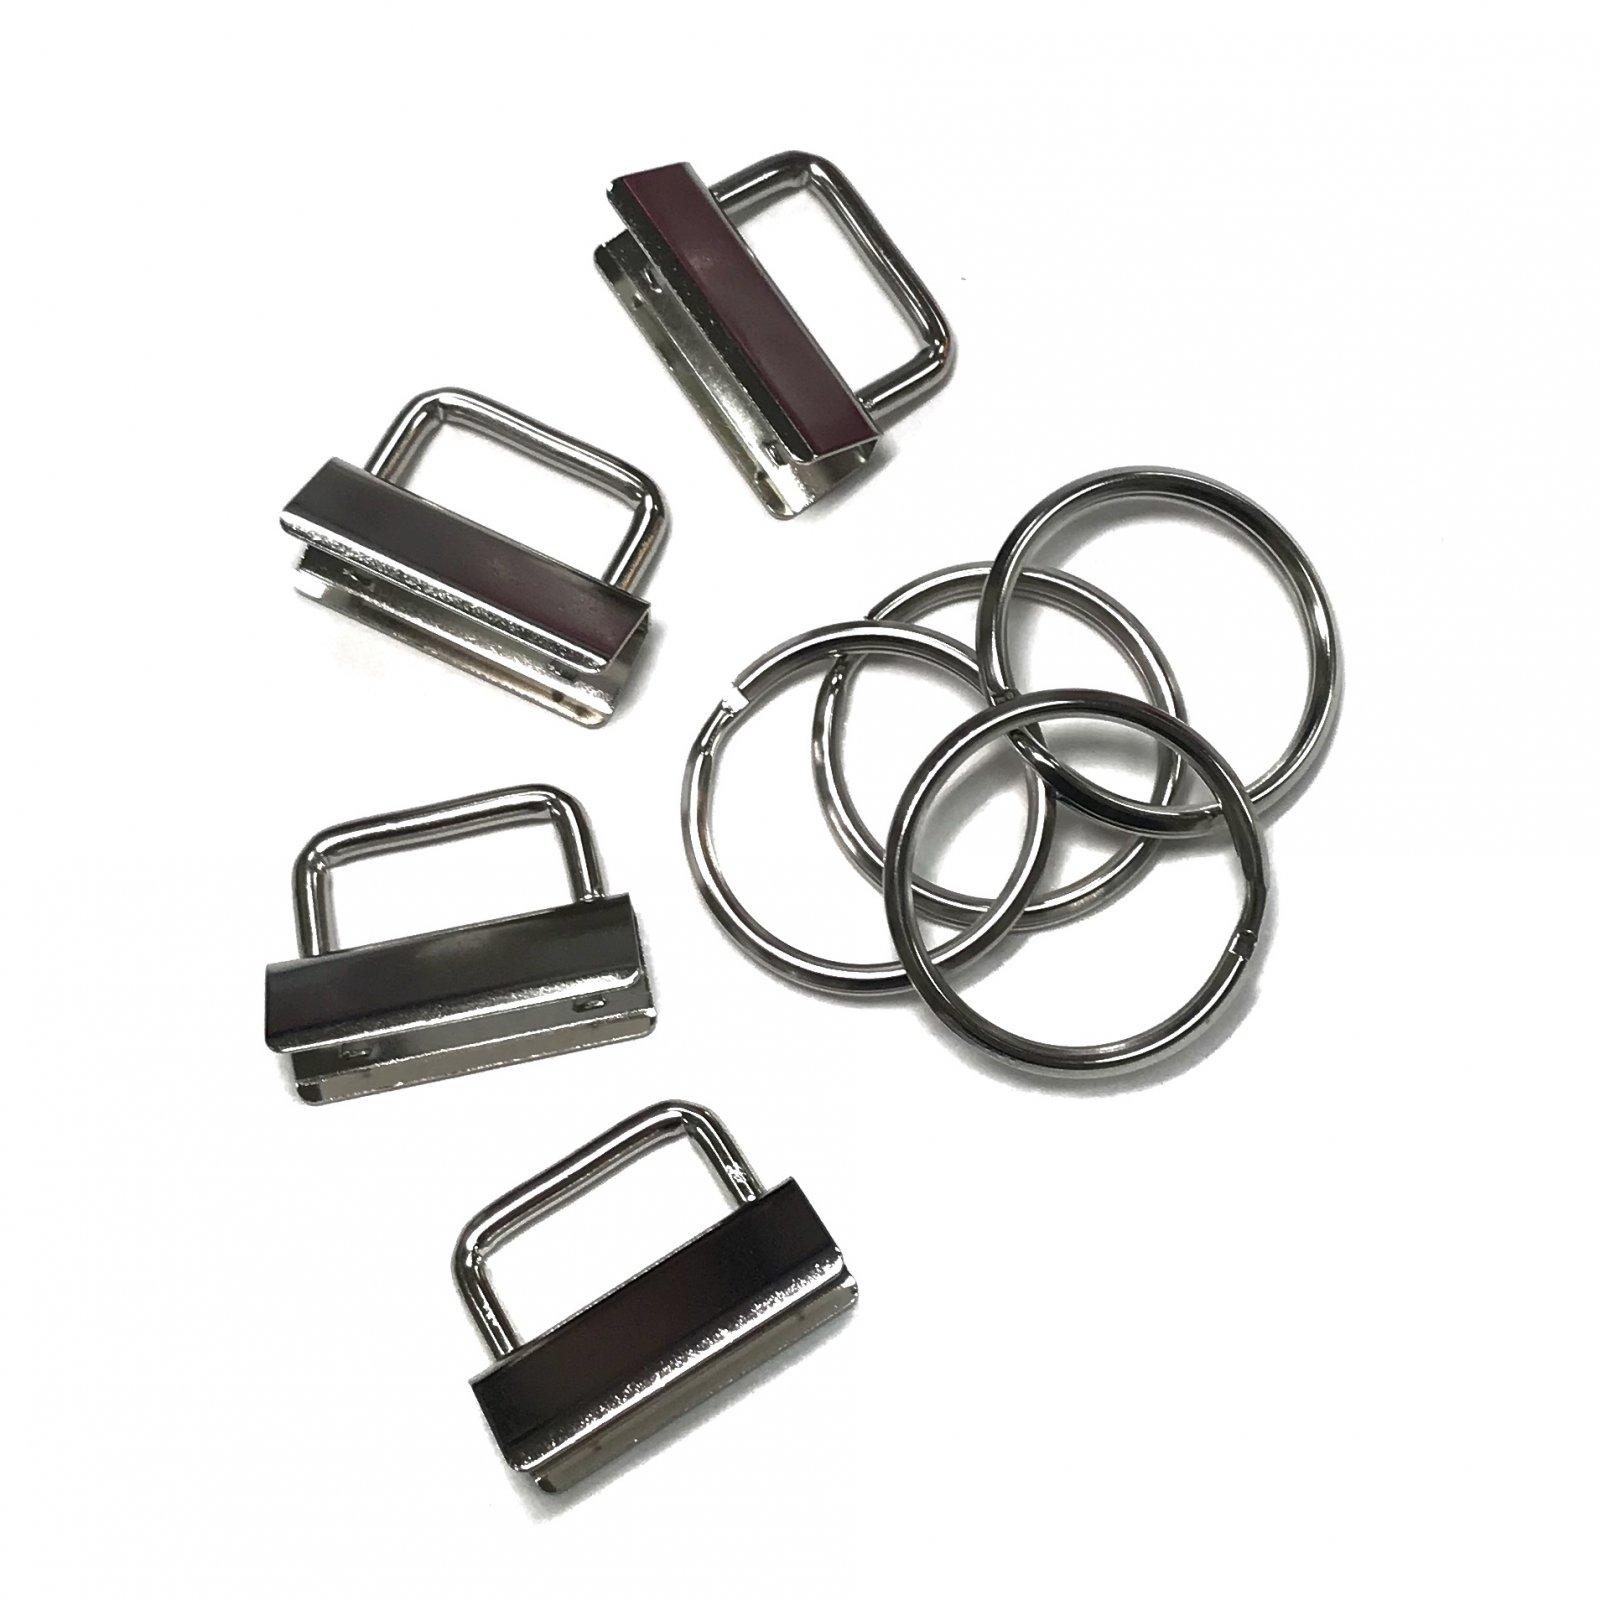 Key Fob Hardware- Silver